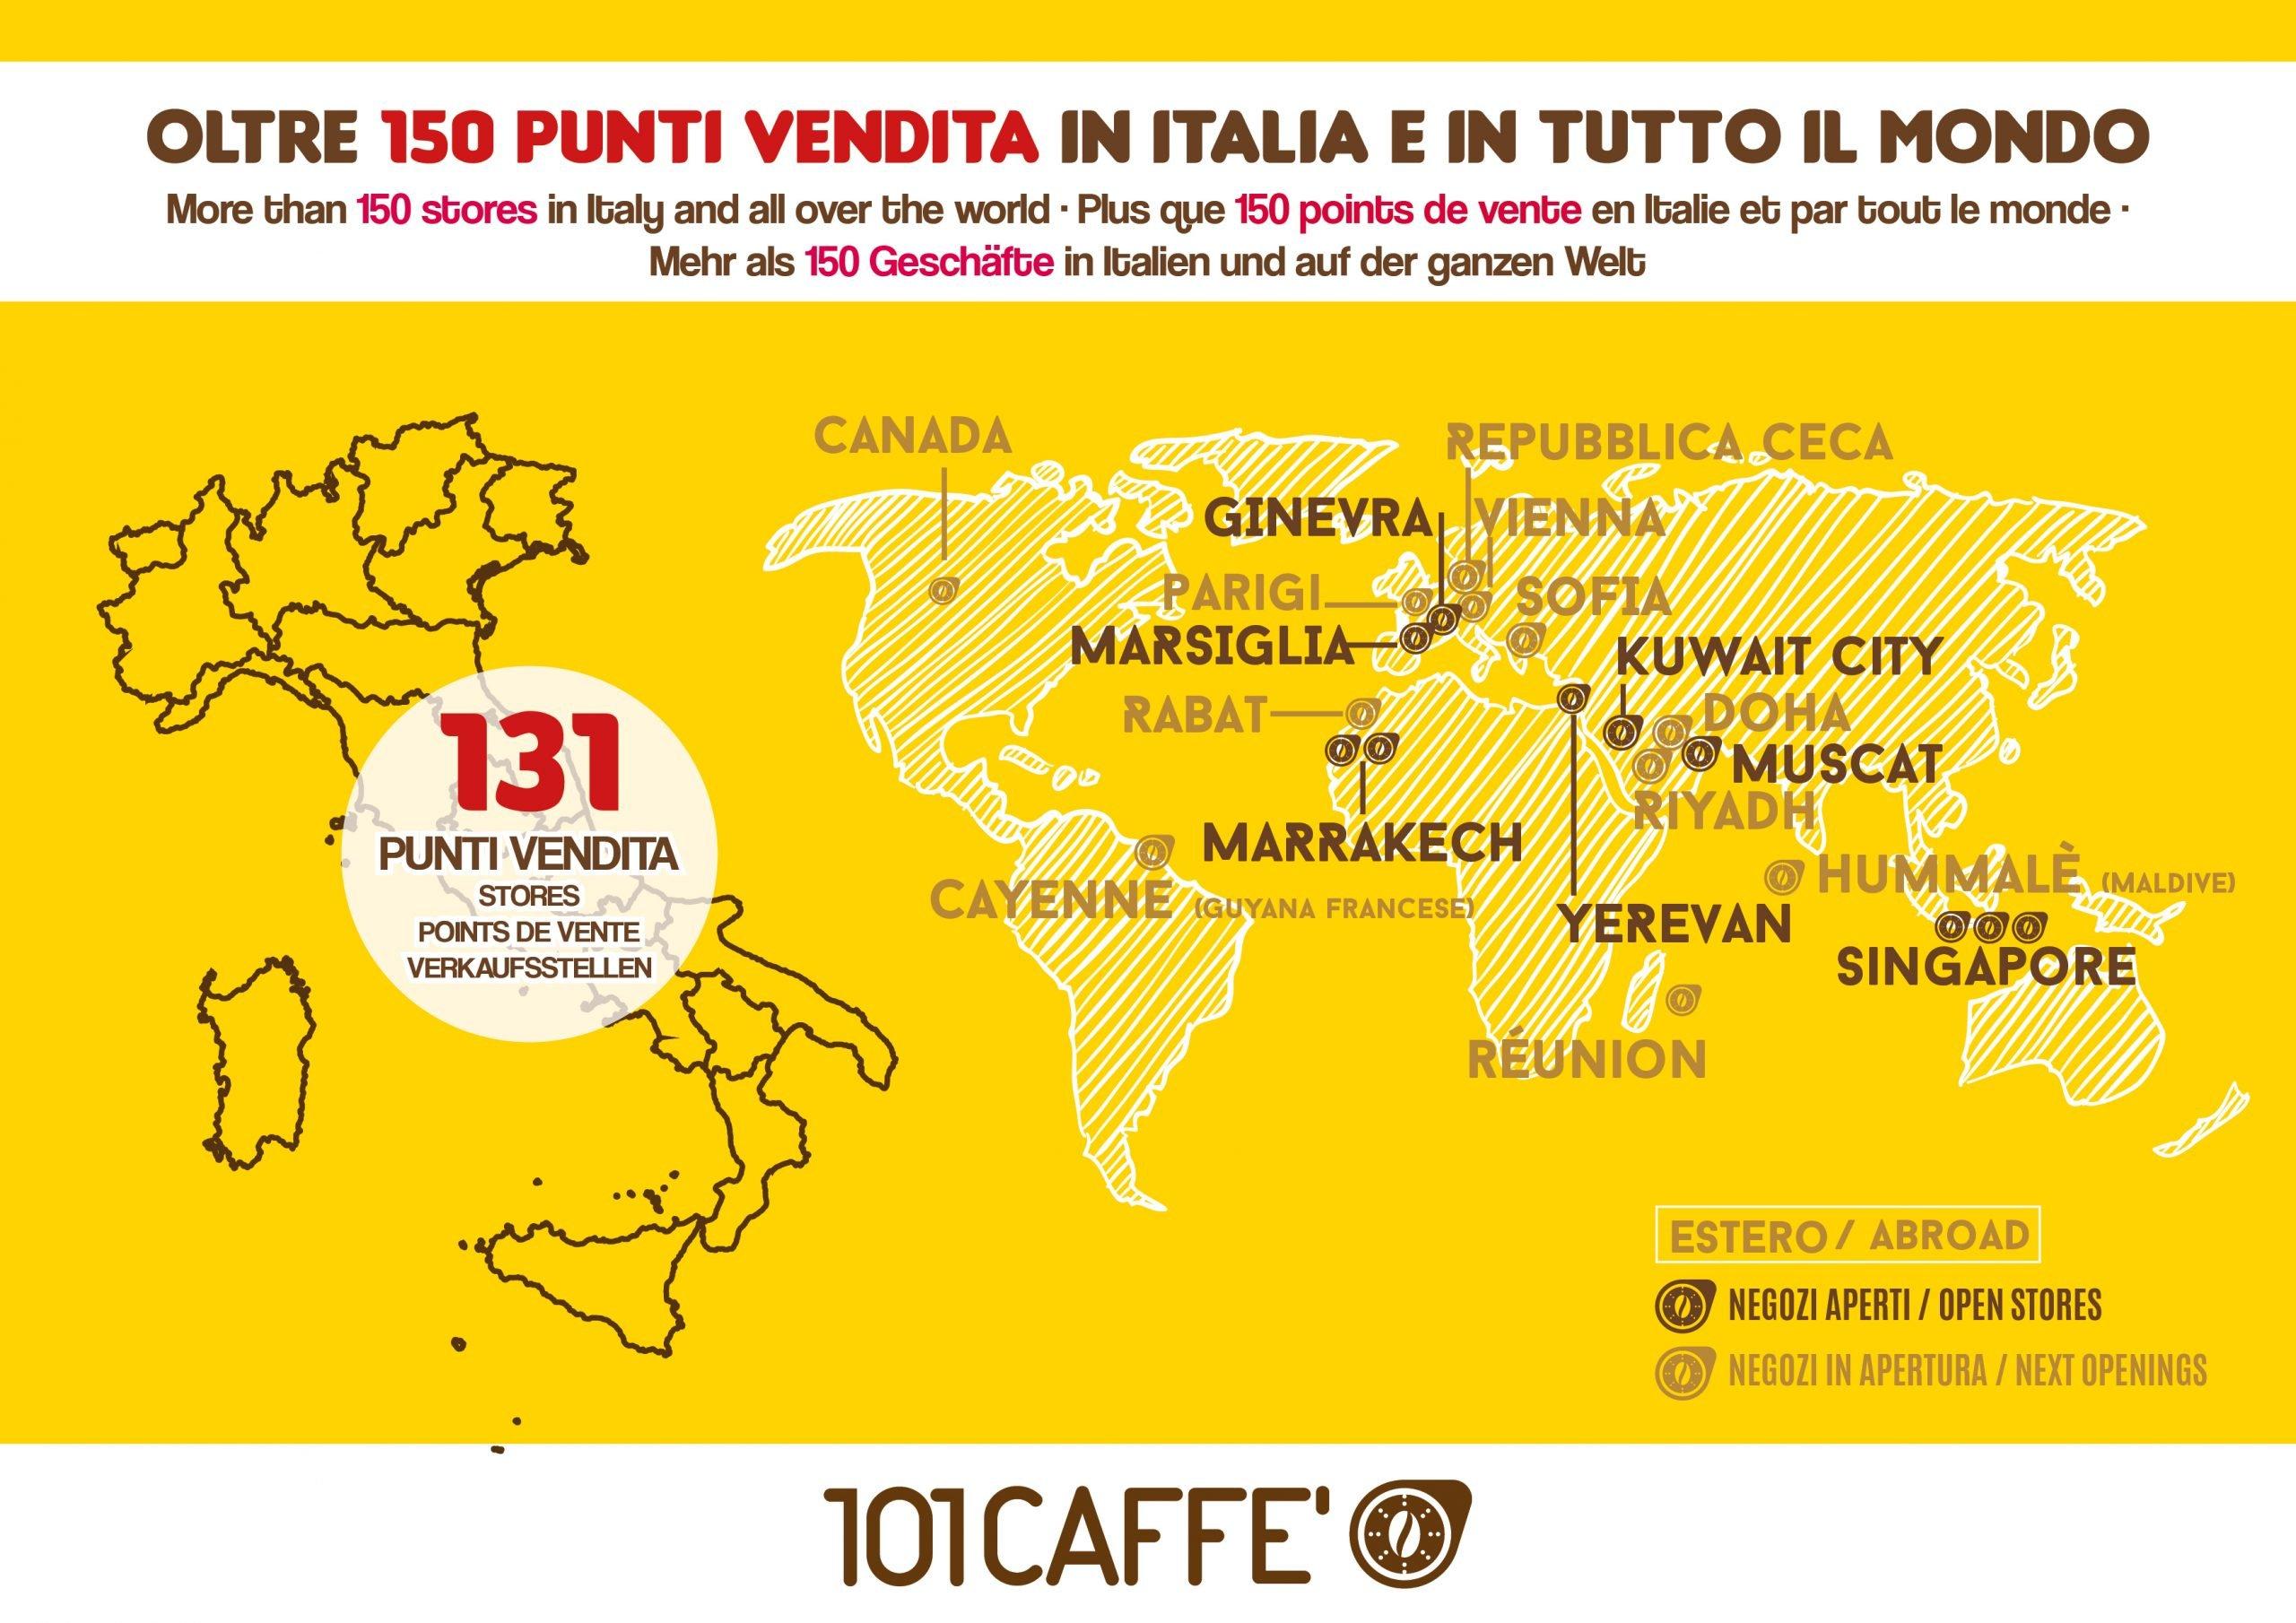 101 CAFFE' la più grande catena di negozi in Franchising di caffè e bevande per tutte le macchine